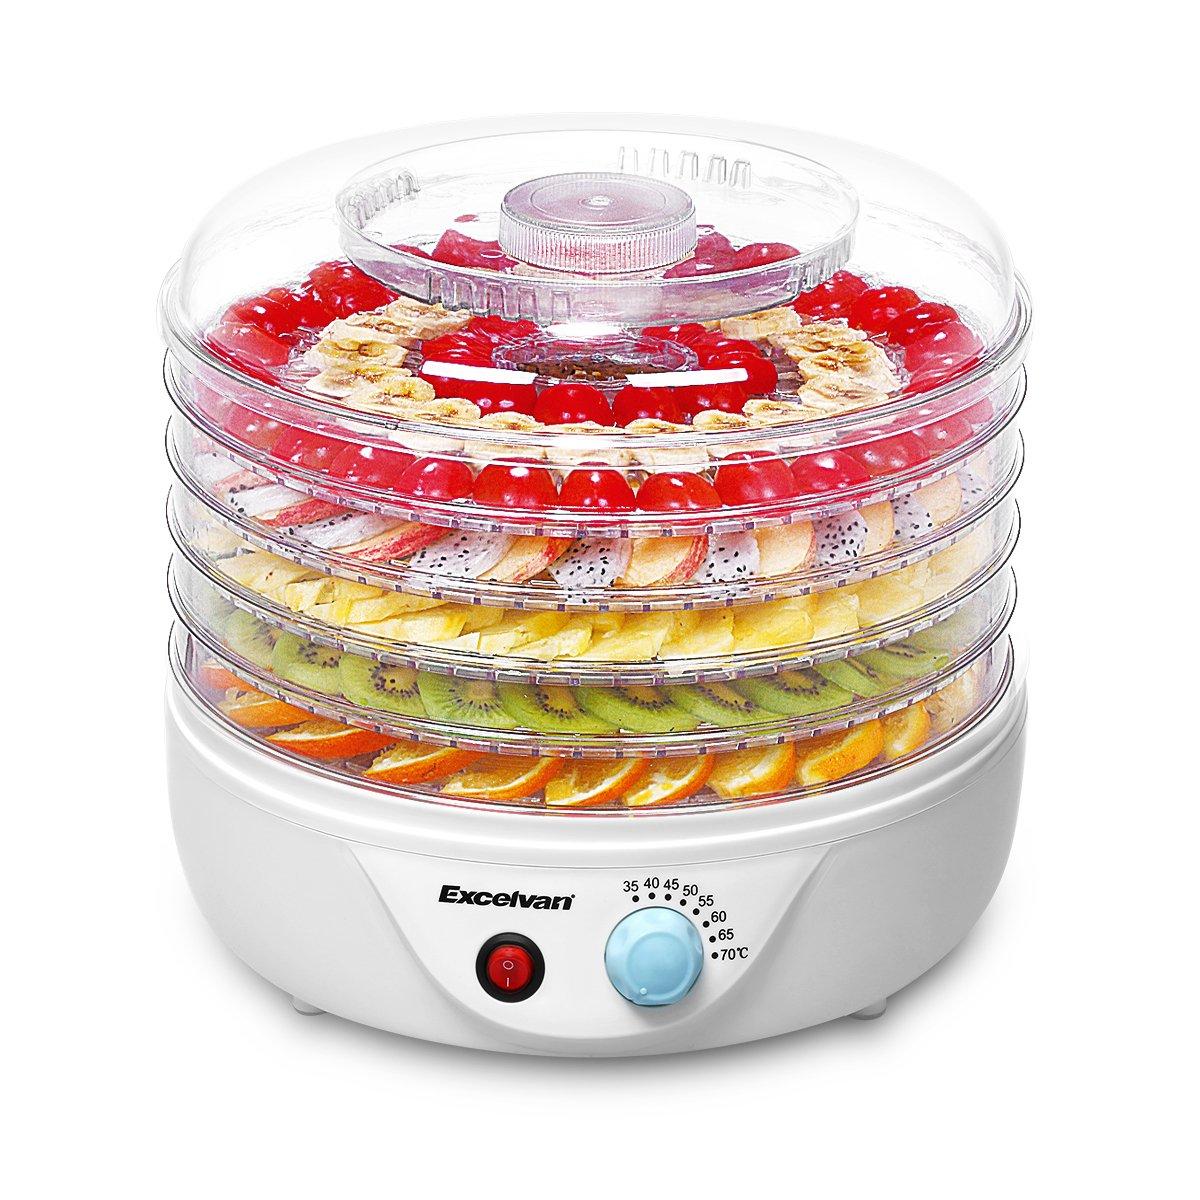 Excelvan 5 Tier 240W Electric Food Fruit Dehydrator Preserver Airflow Circulation with Adjustable Temperature Control Natural Healthy by Excelvan